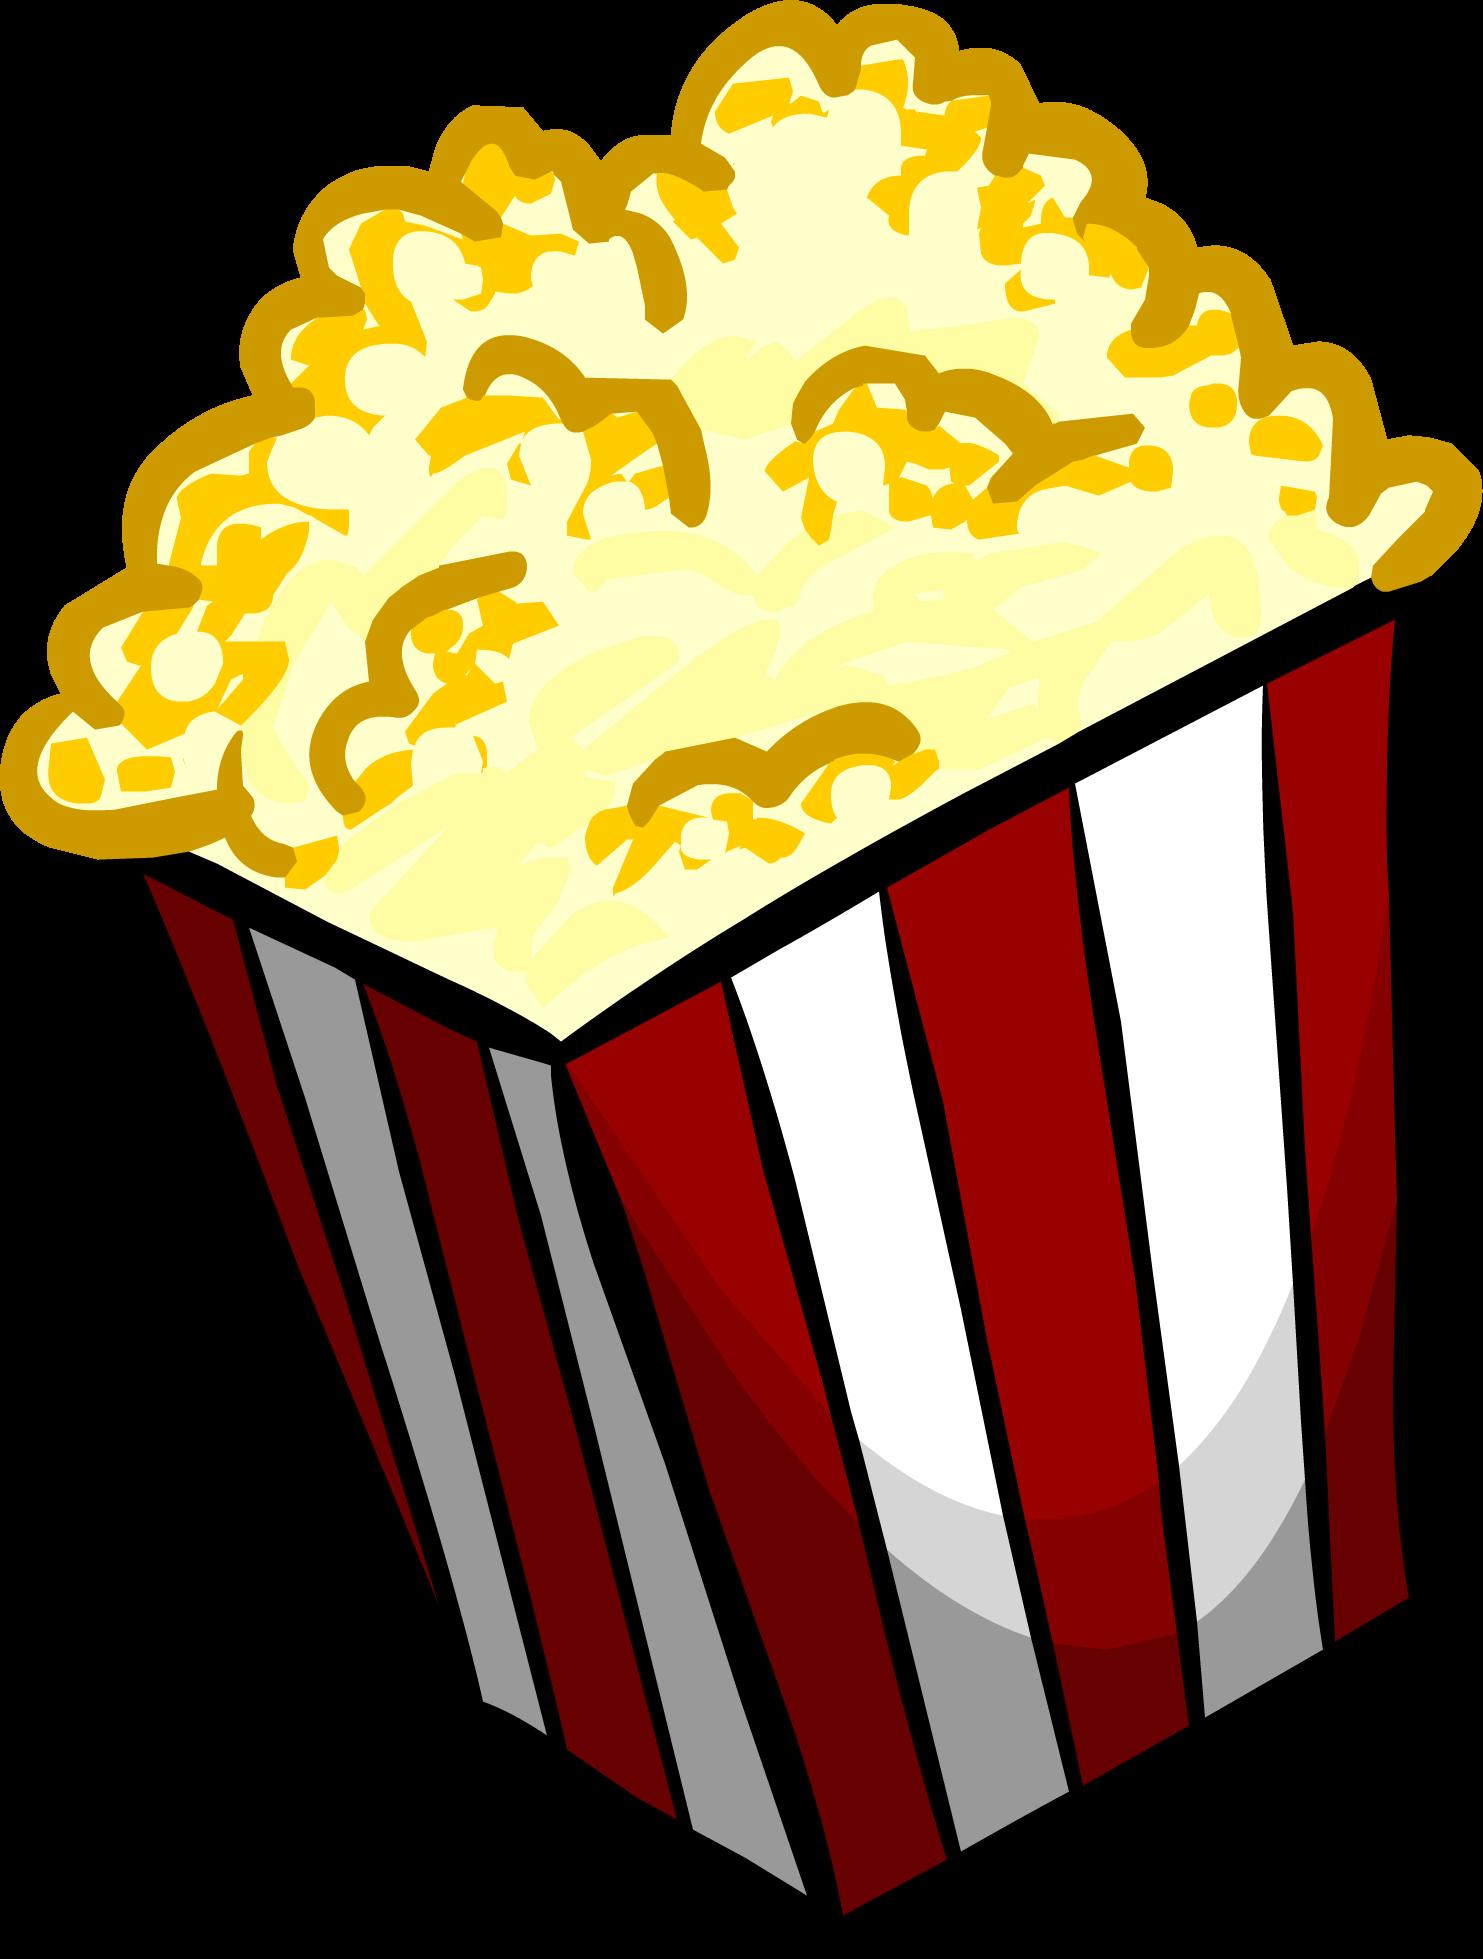 Popcorn PNG - 27886